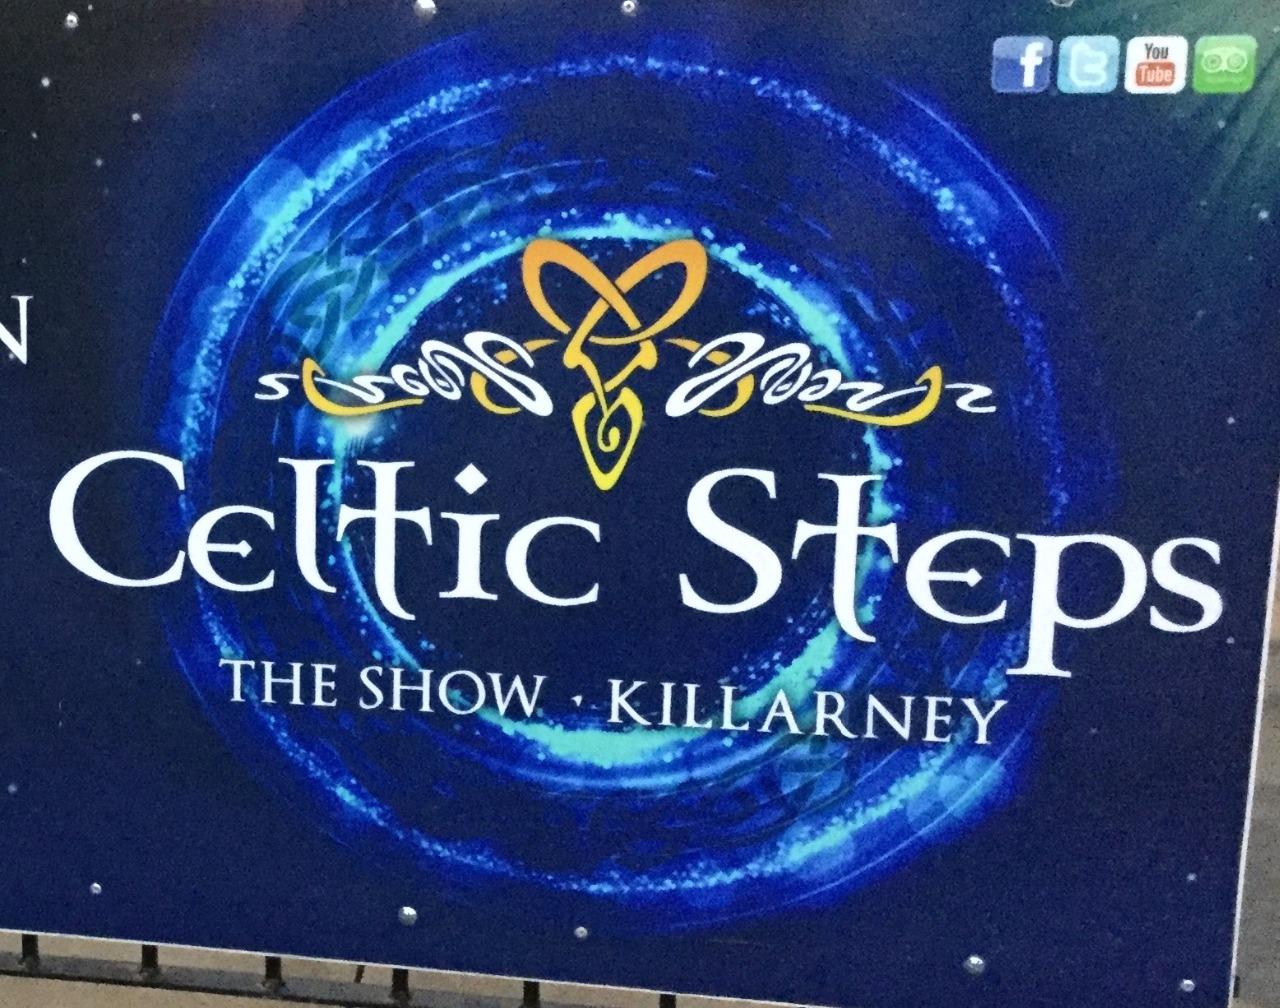 Great Irish song and dance